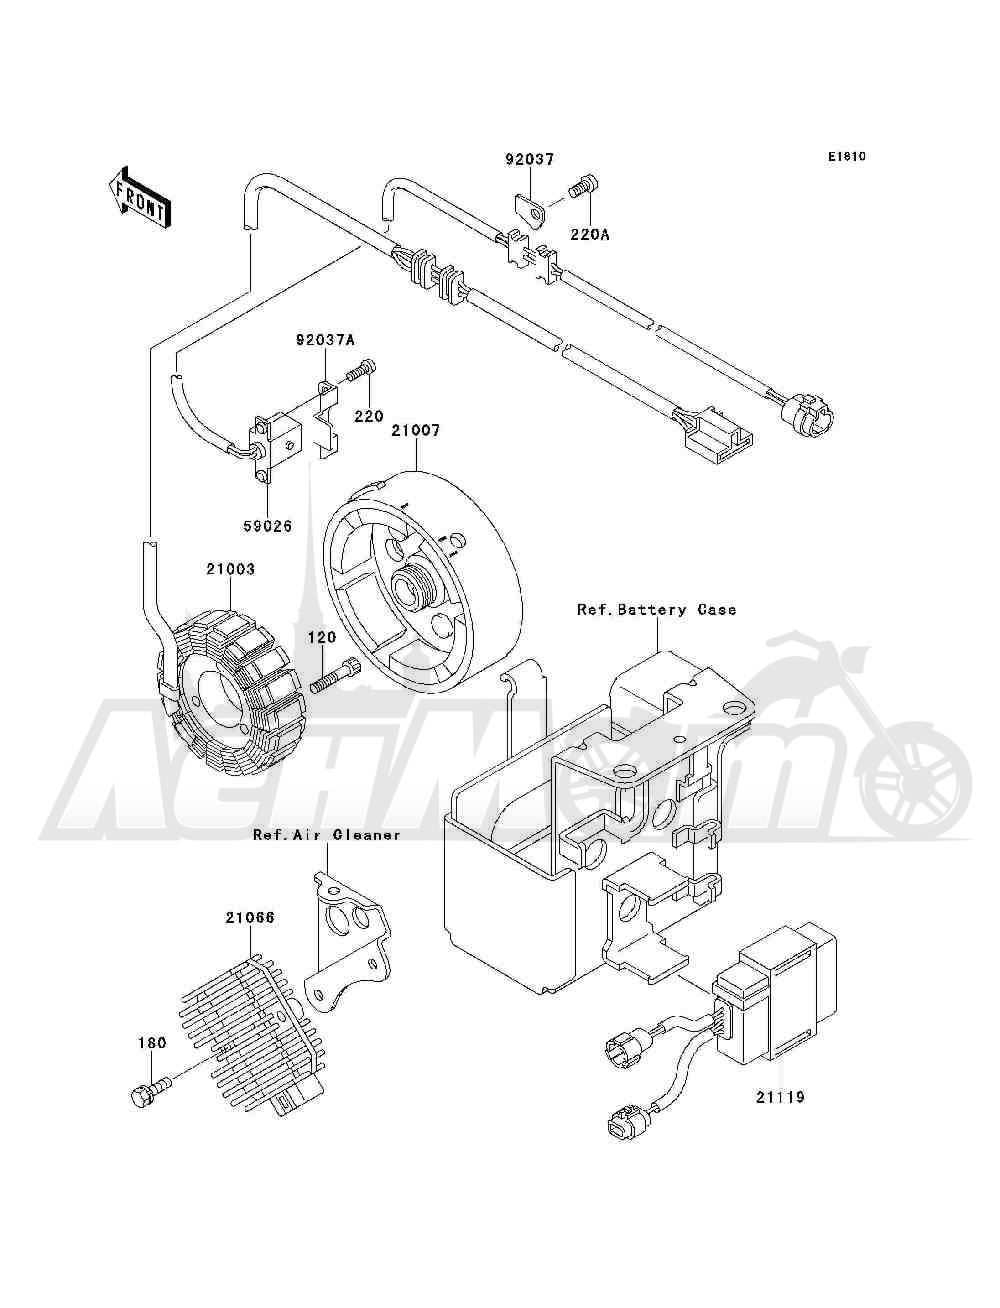 Запчасти для Квадроцикла Kawasaki 1993 BAYOU 300 4X4 (KLF300-C5) Раздел: GENERATOR | генератор